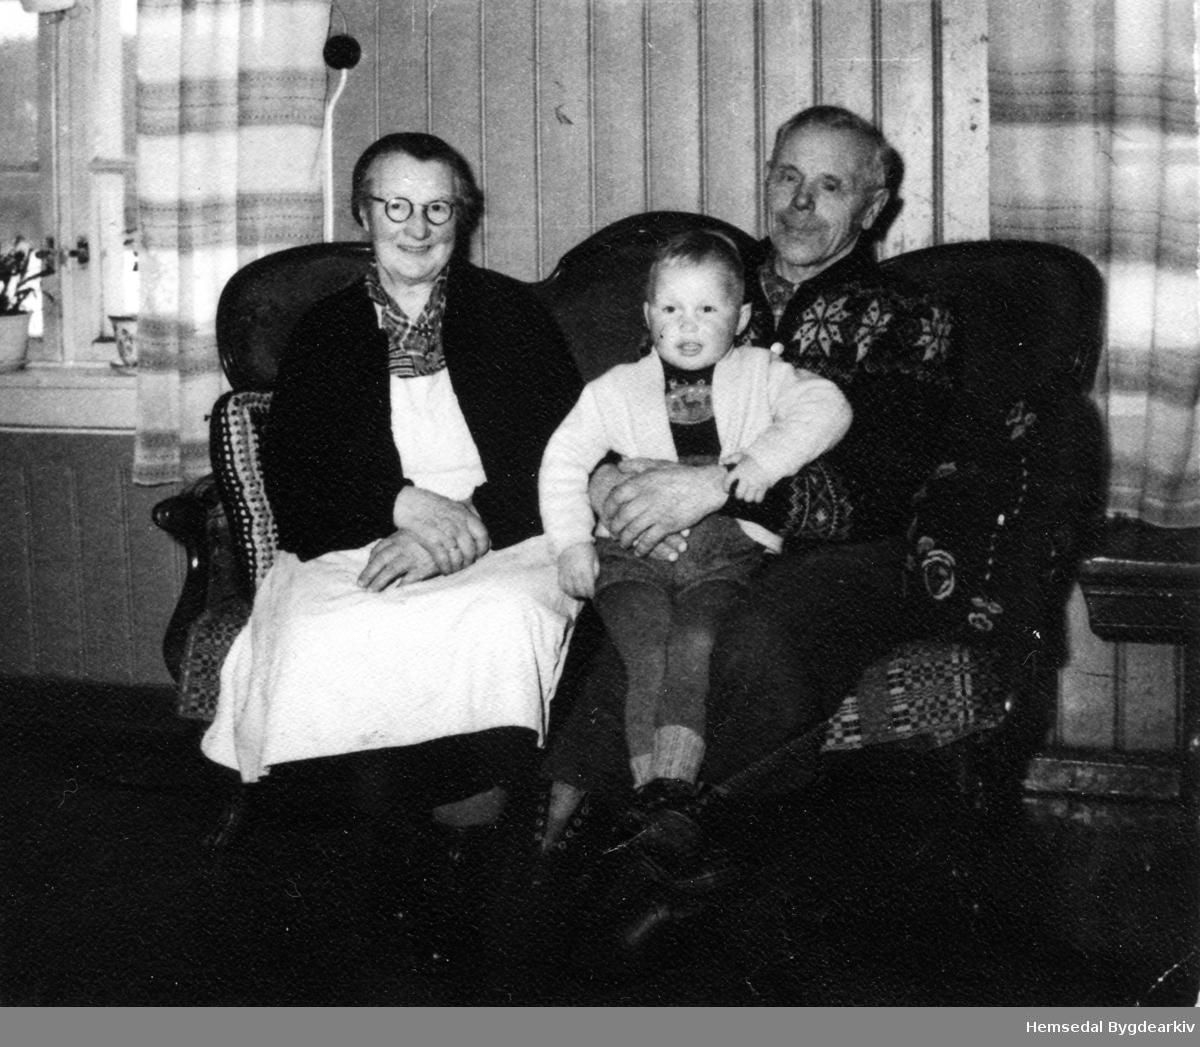 Anne Jordheim og Ola O. Jordheim med barnebarnet Oddmund Jordheim, ca. 1960